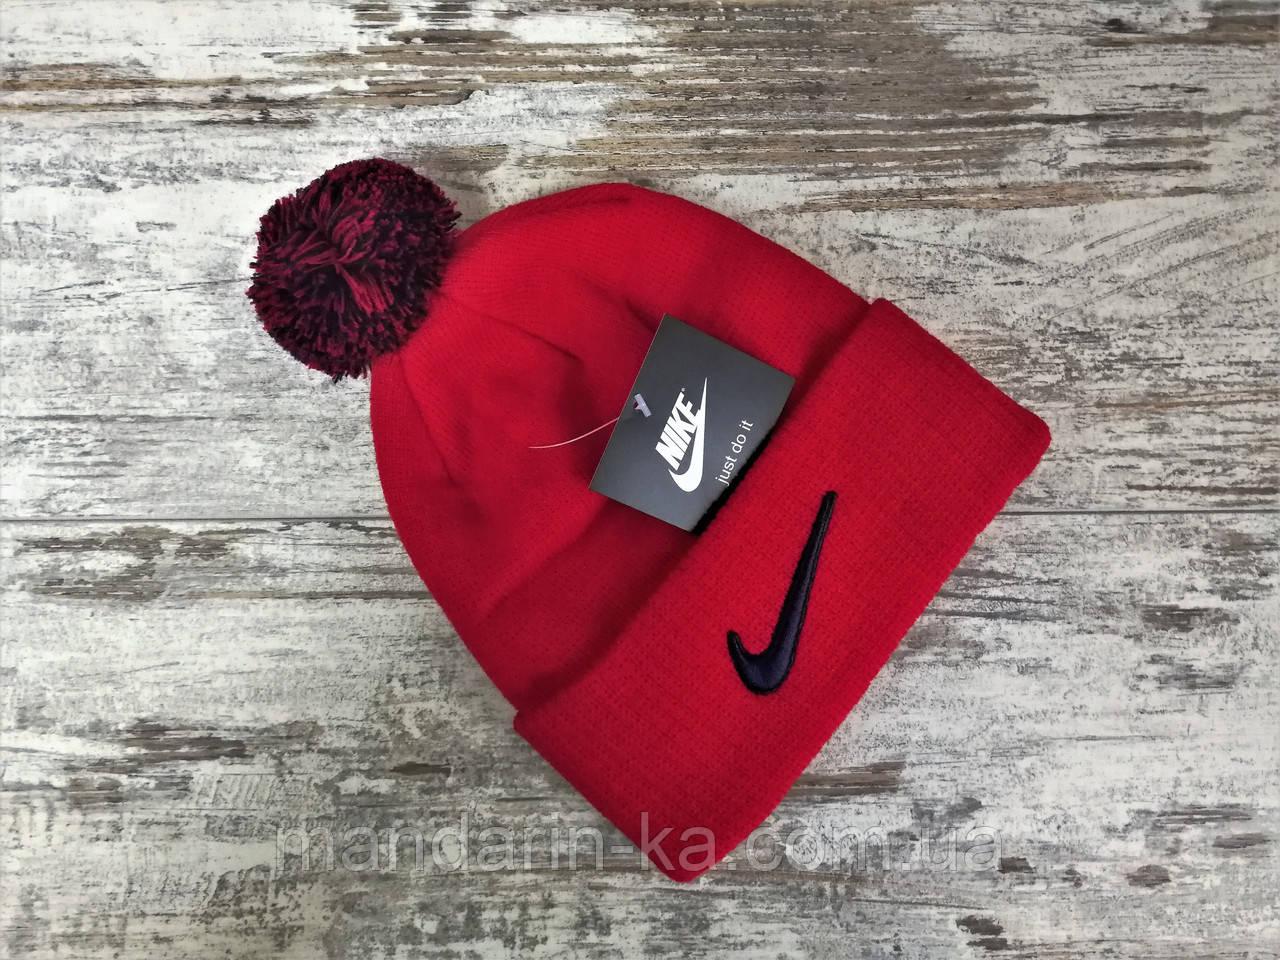 Шапка  мужская  красная  Nike Найк  (реплика)